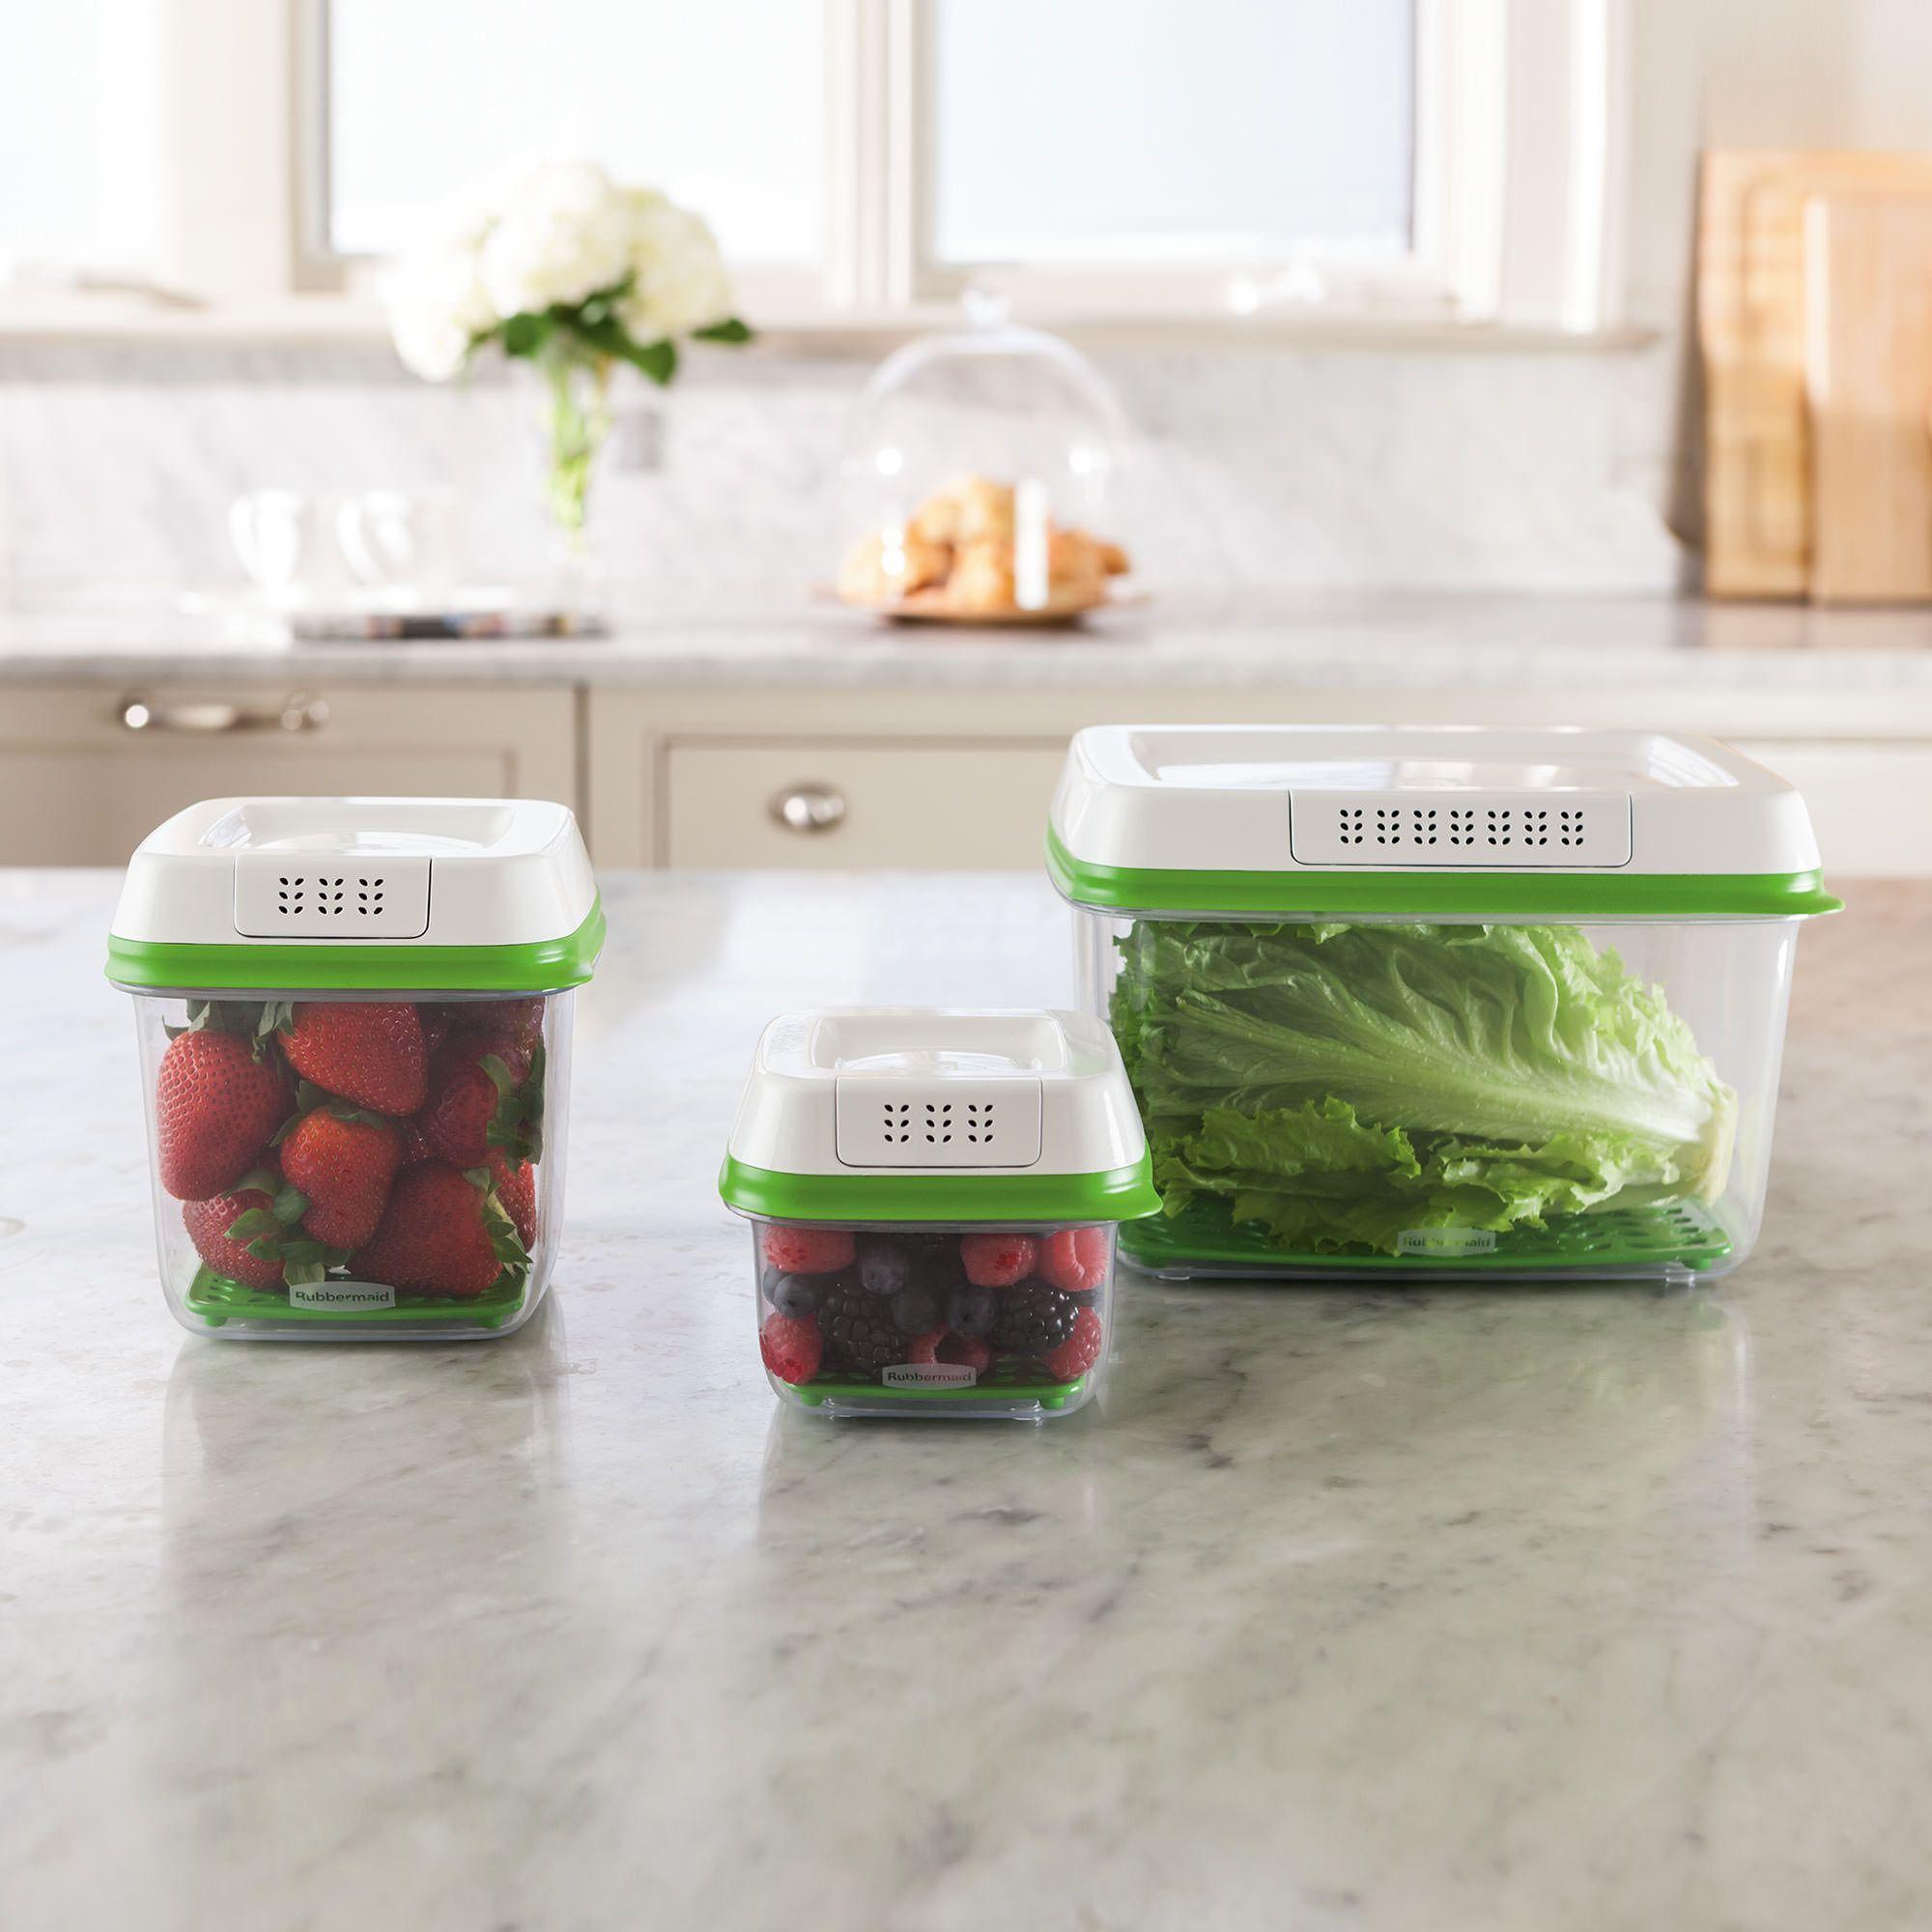 Home Produce Saver Healthy Low Carb Recipes Organic Recipes